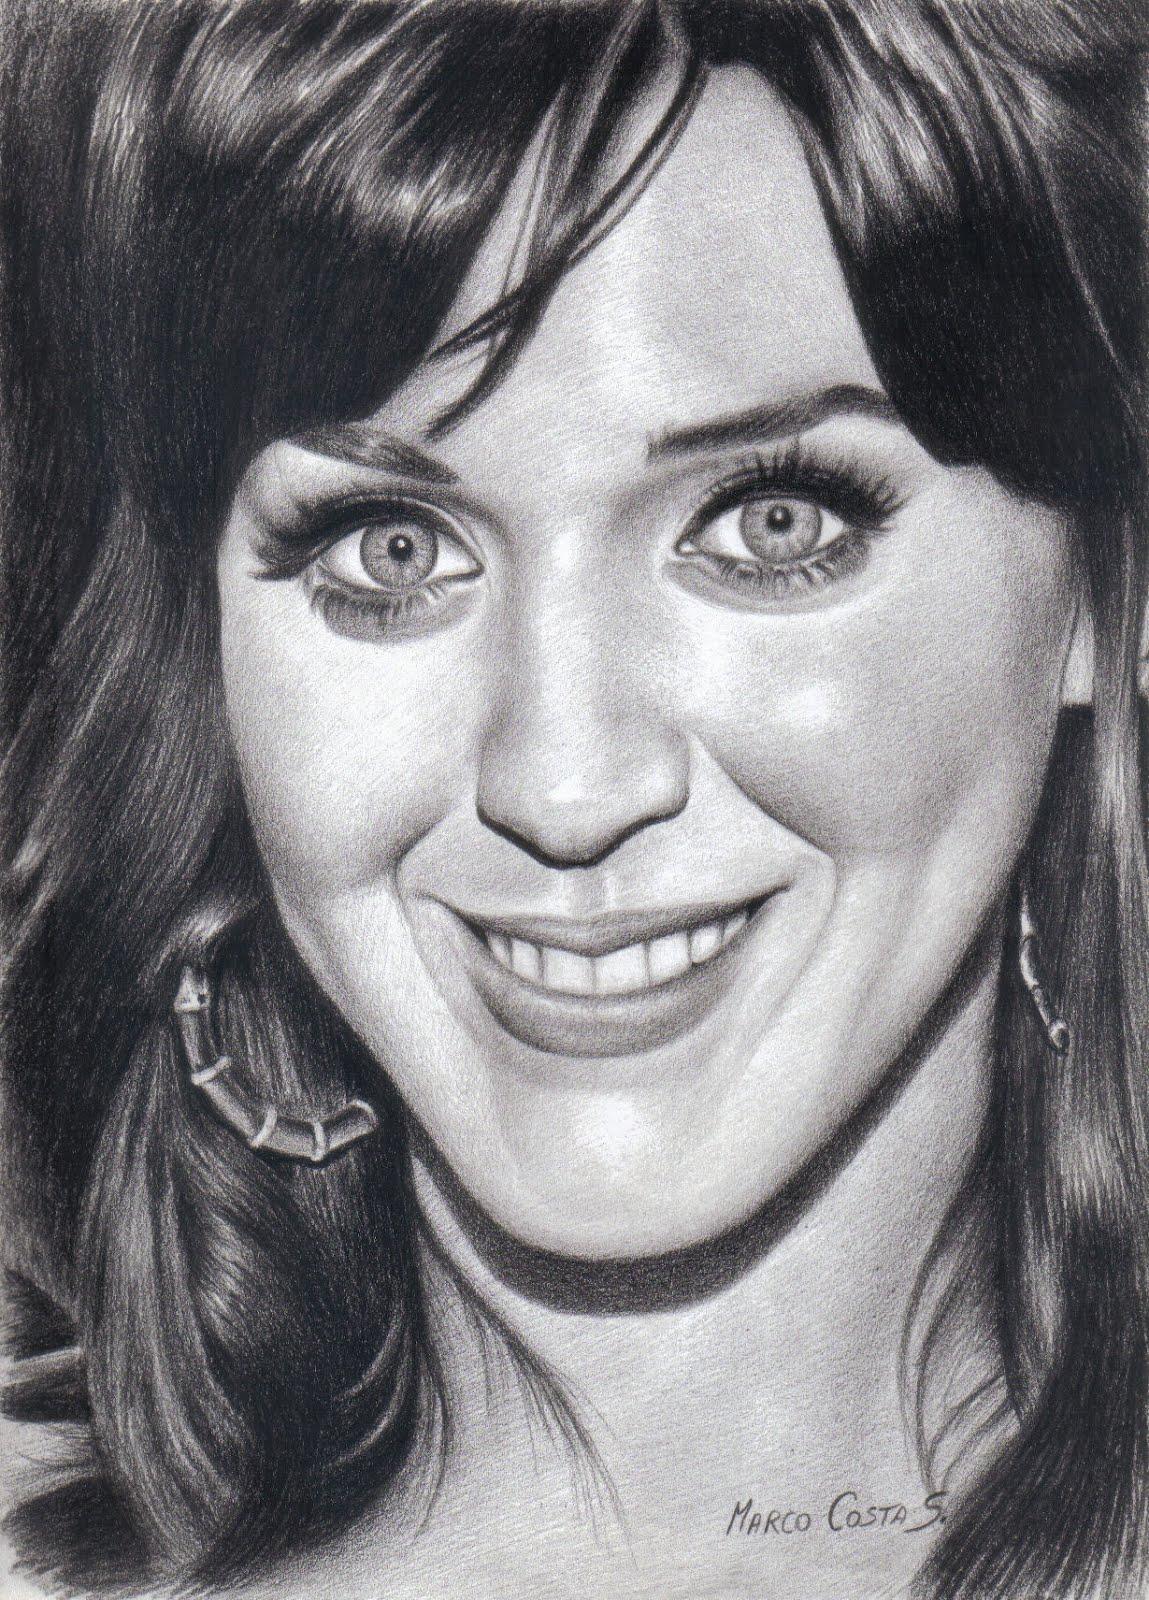 Marco Costa Artista Visual: Katy Perry